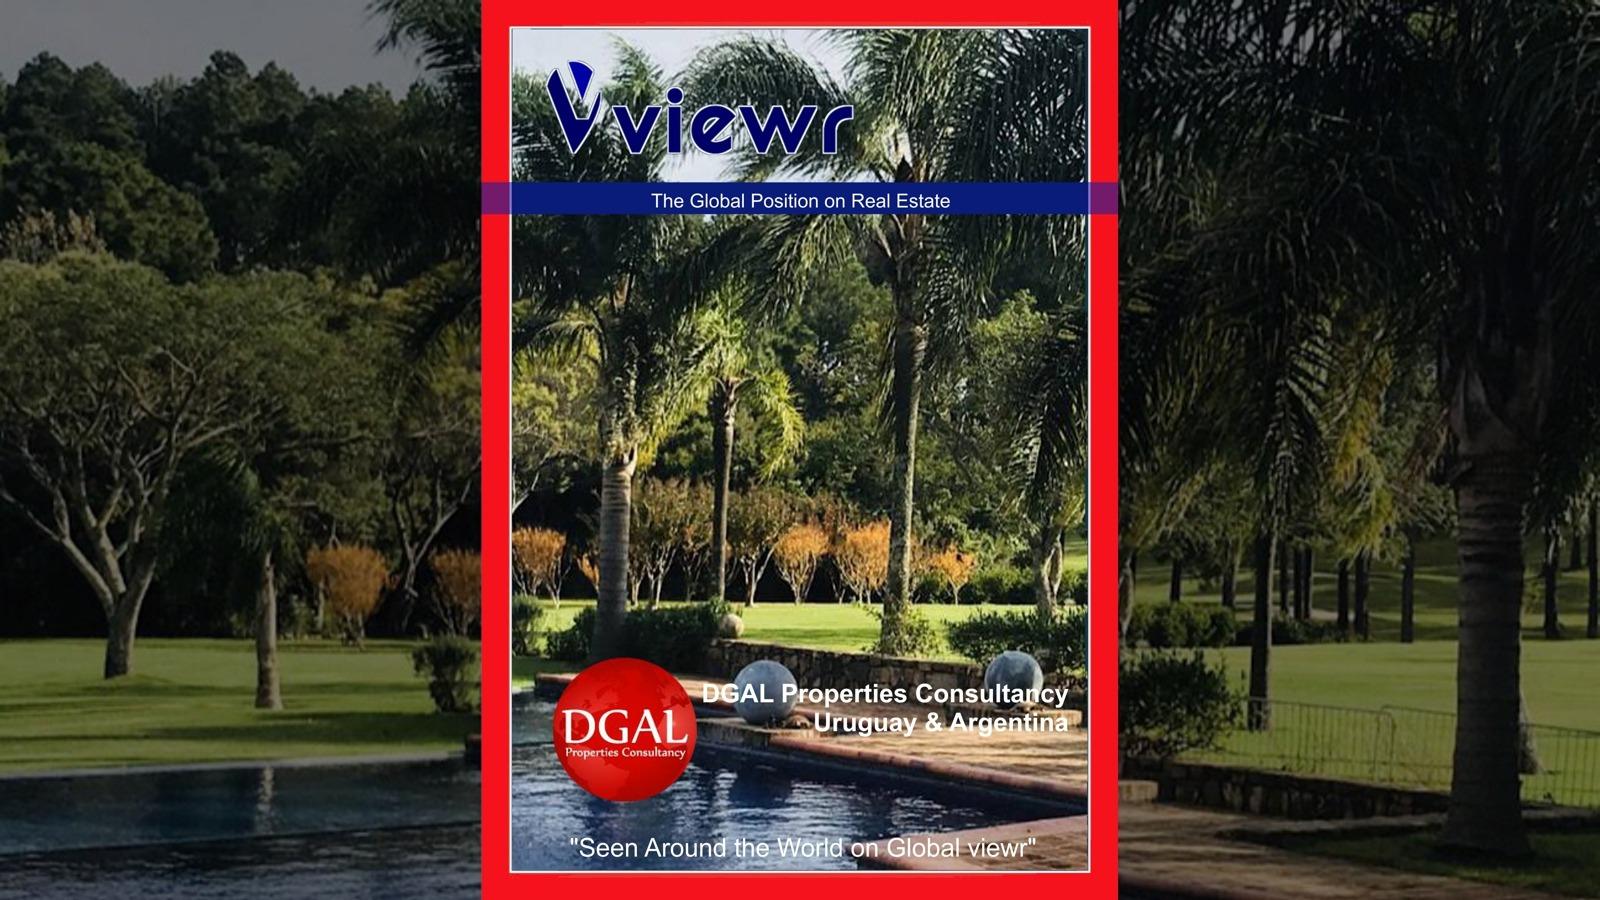 Global viewr Magazine DGAL Properties Consultancy Argentina Uruguay